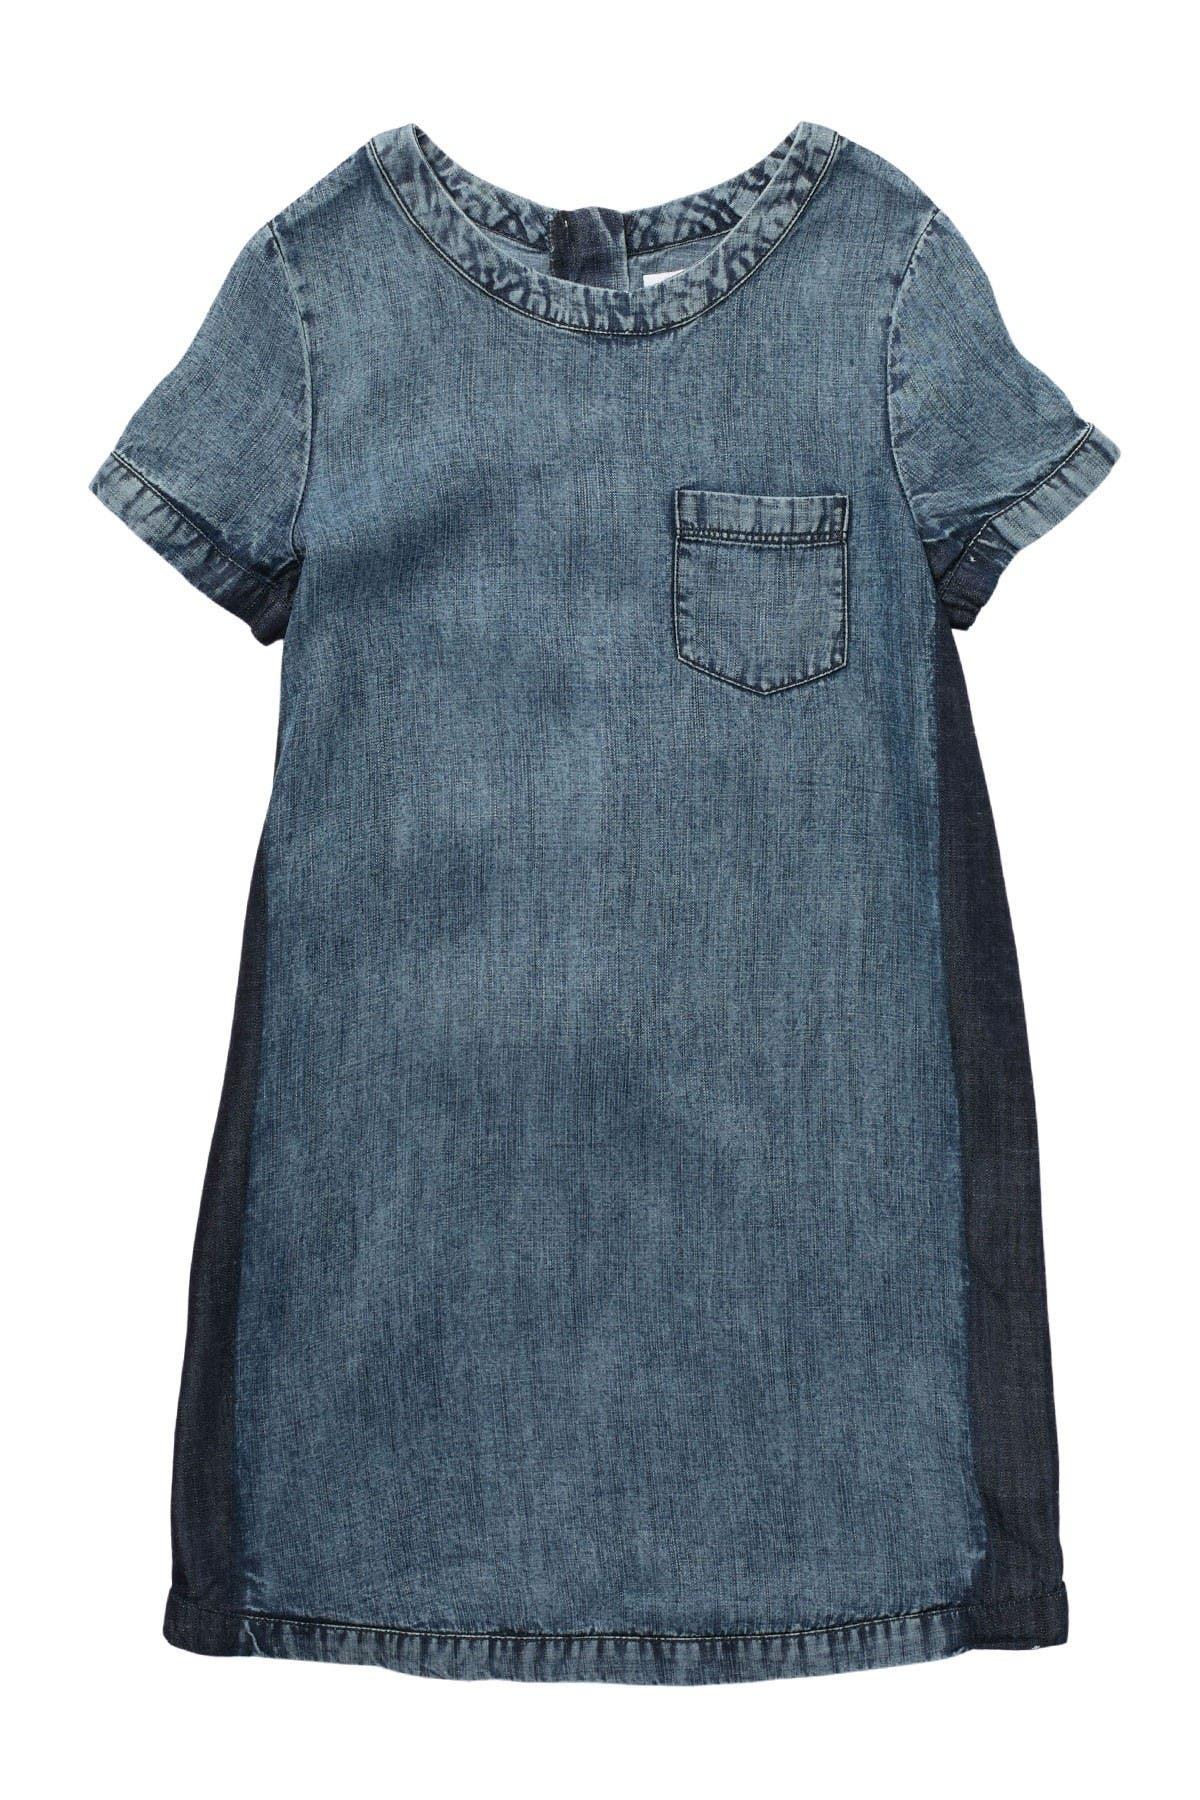 Image of ELLA MOSS GIRL Denim Dress